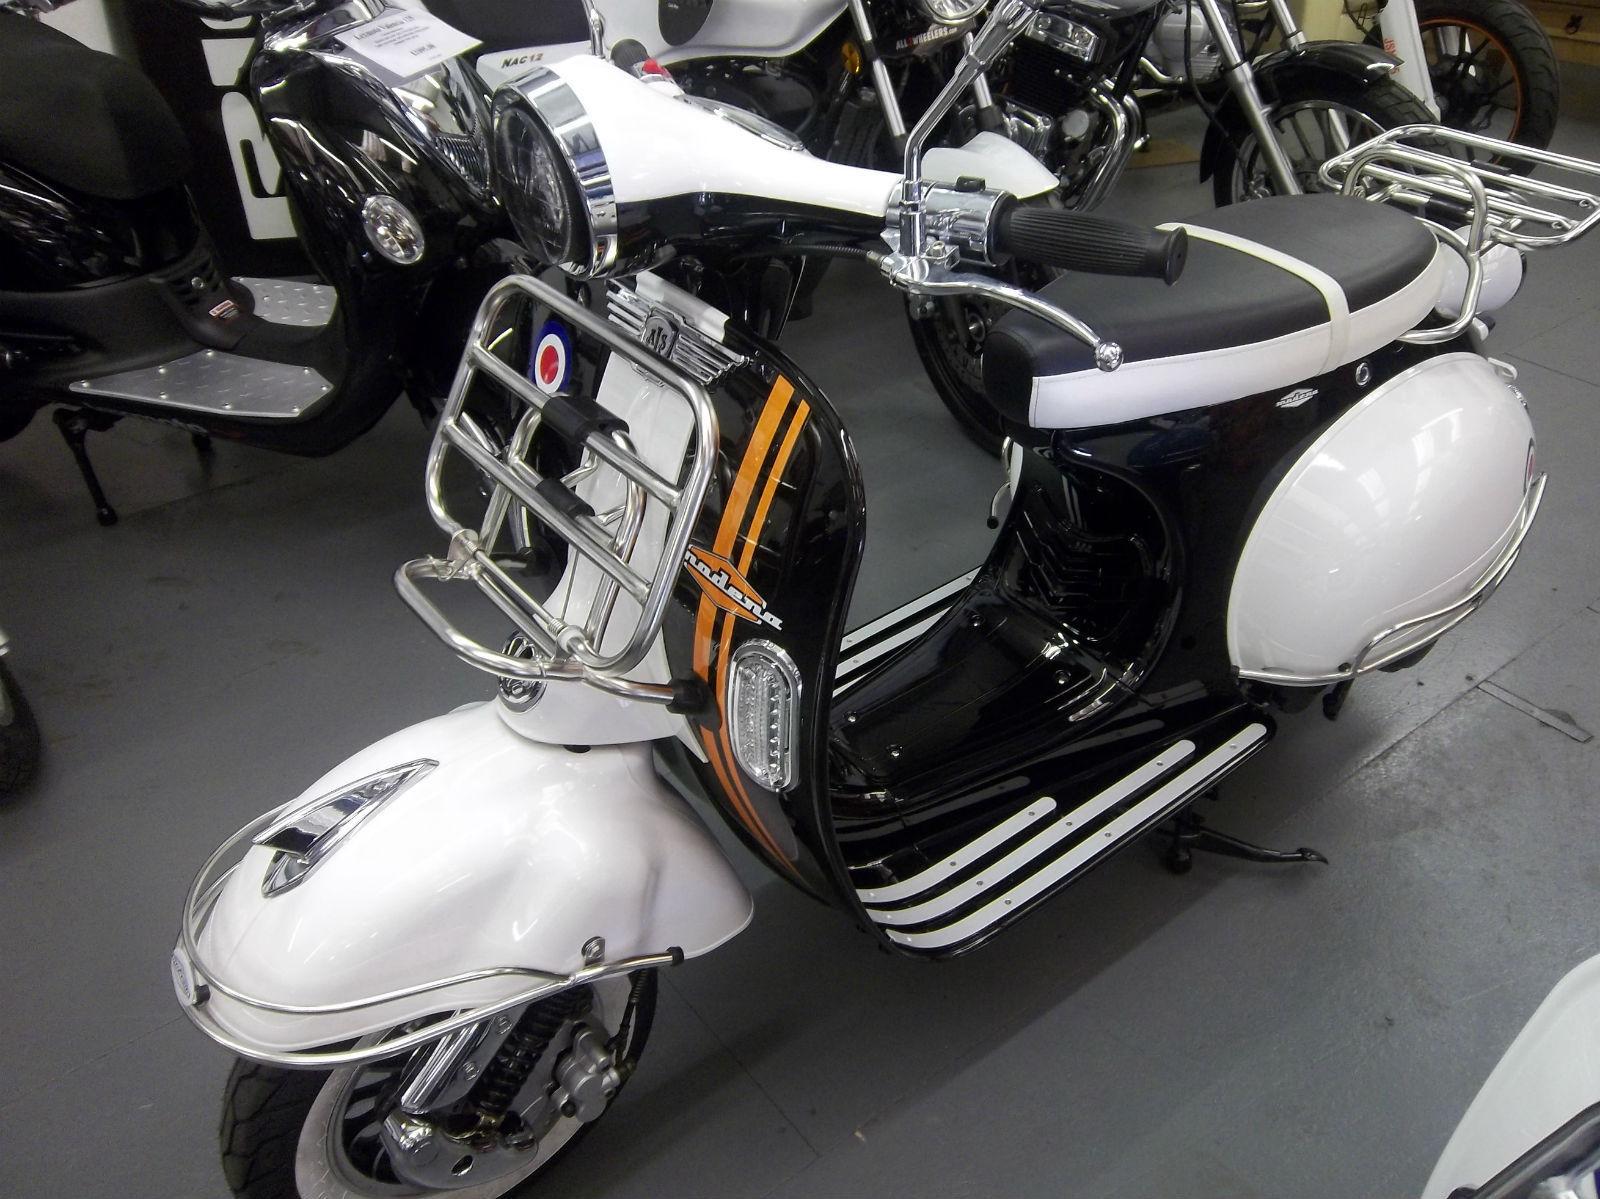 Ajs Modena 125 50 Cc Scooter Vespa T5 Px 1950 60s Body Wiring Diagram Fully Auto